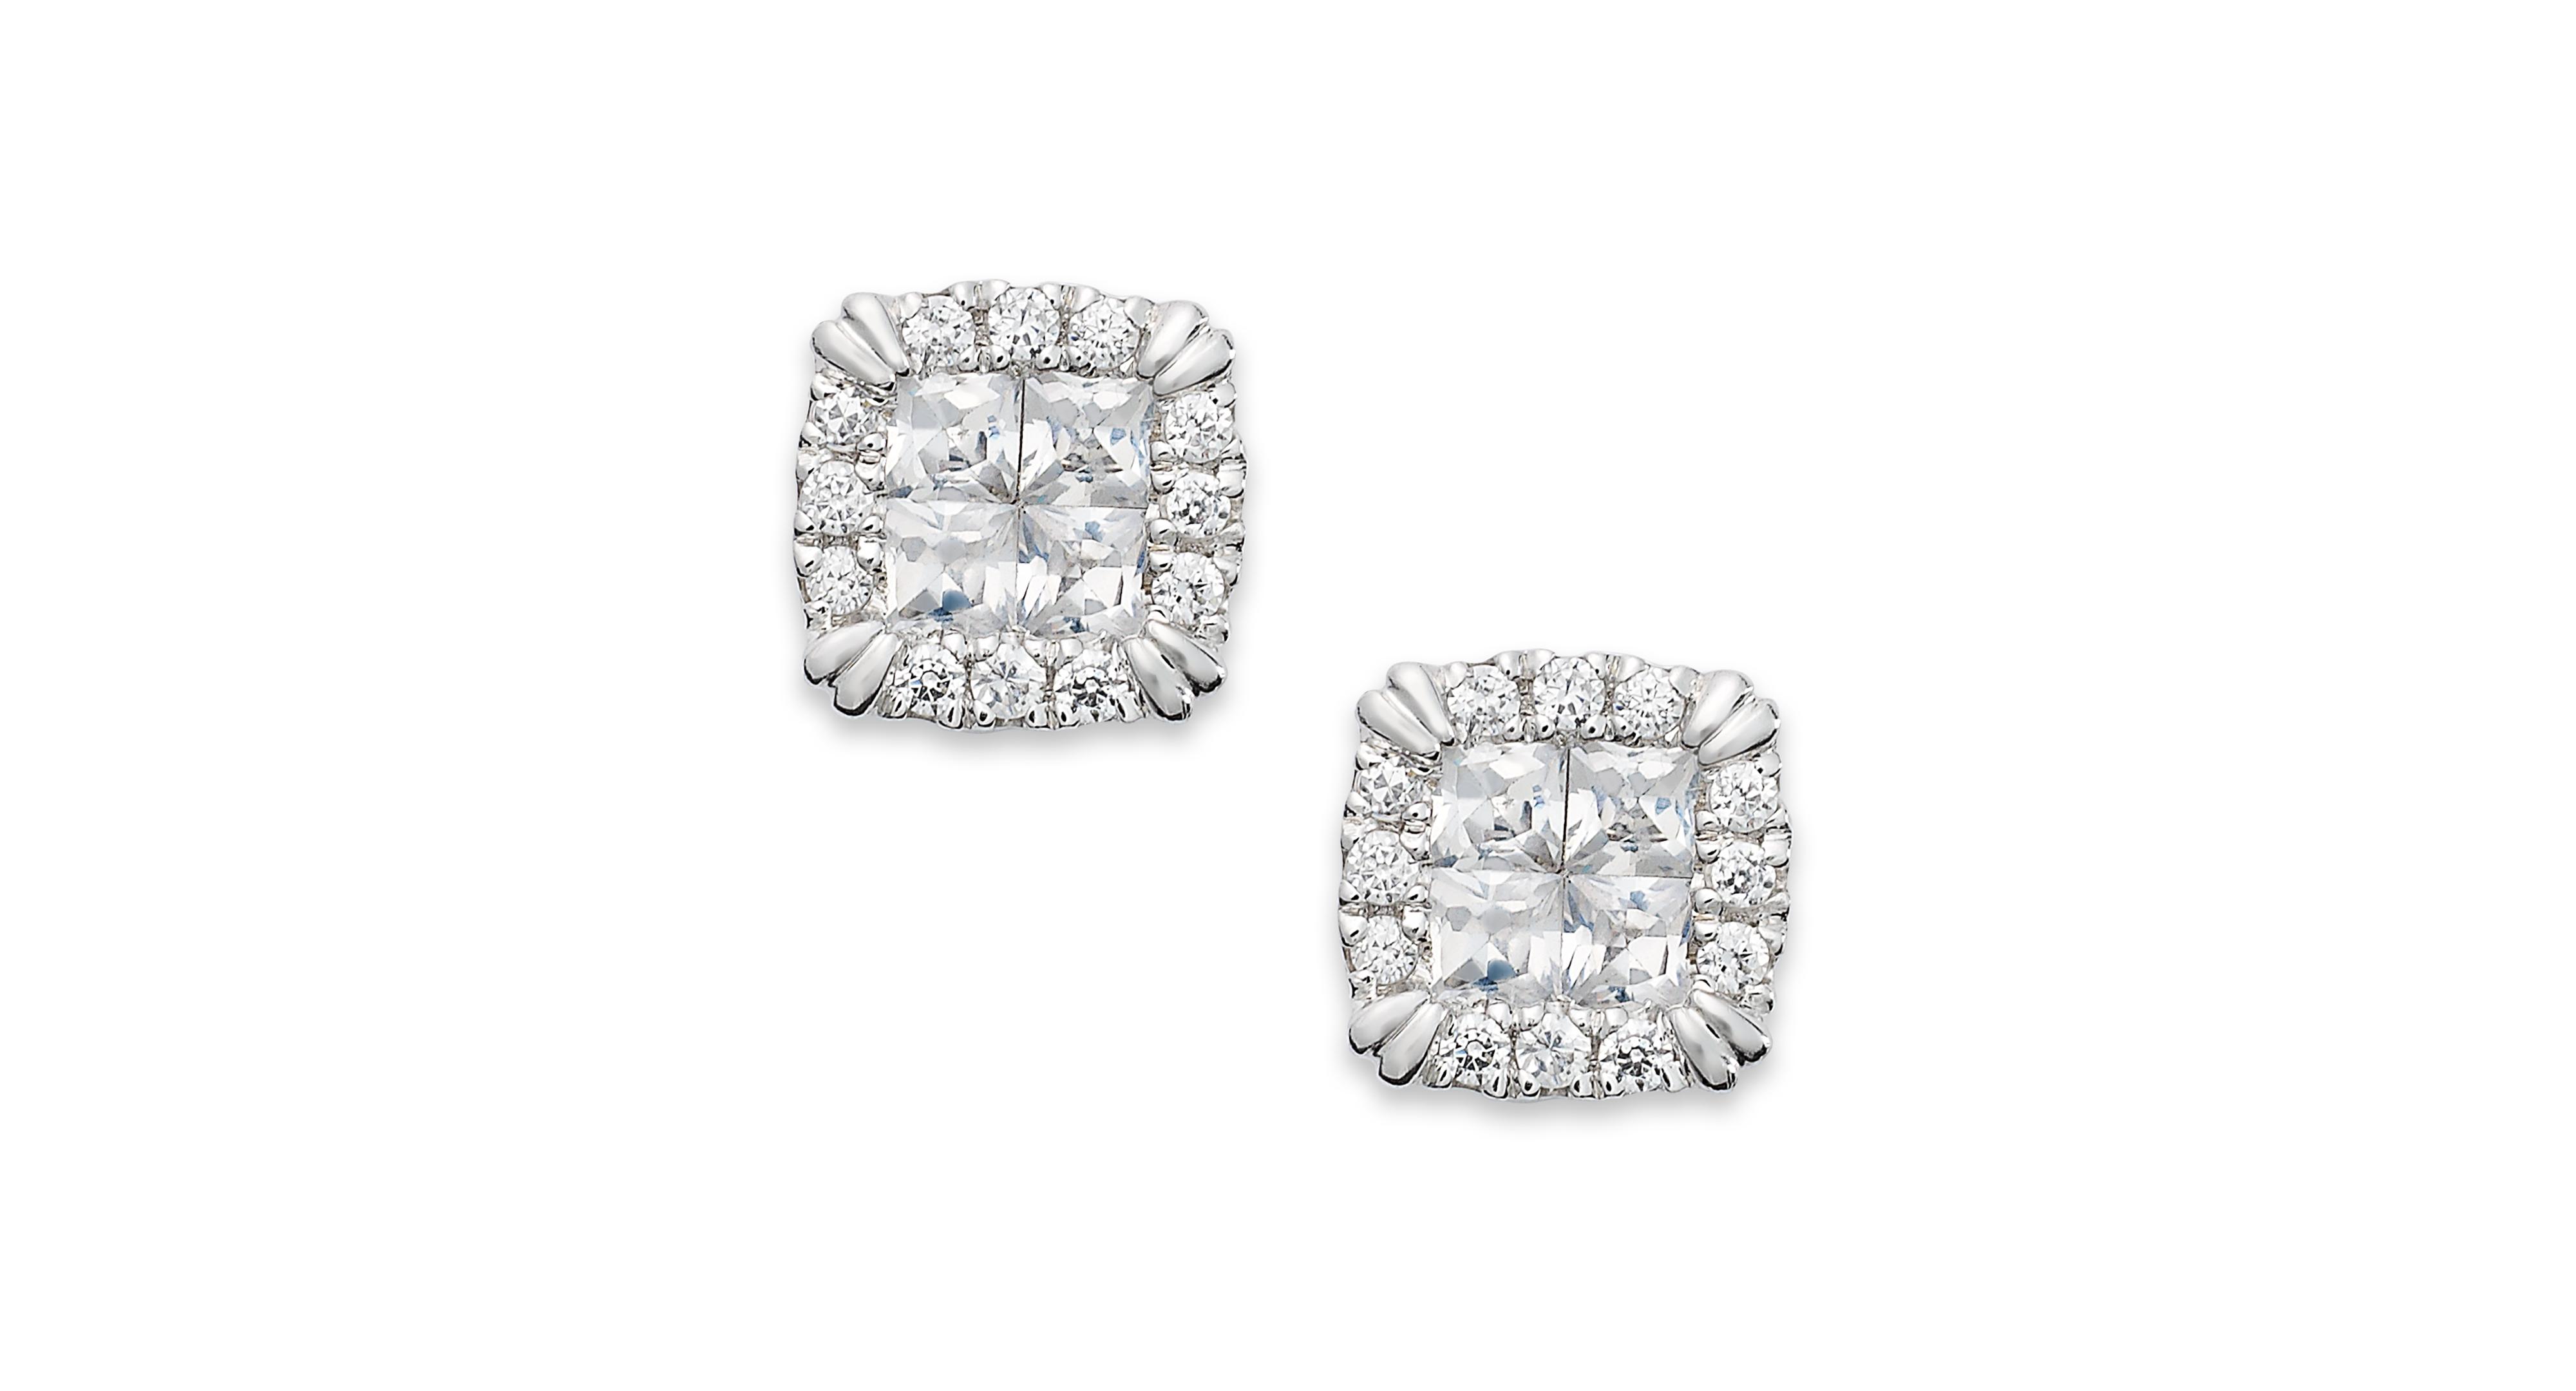 Princess Treasures Diamond Stud Earrings In 14k White Gold 1 1 4 Ct T W Diamond Studs